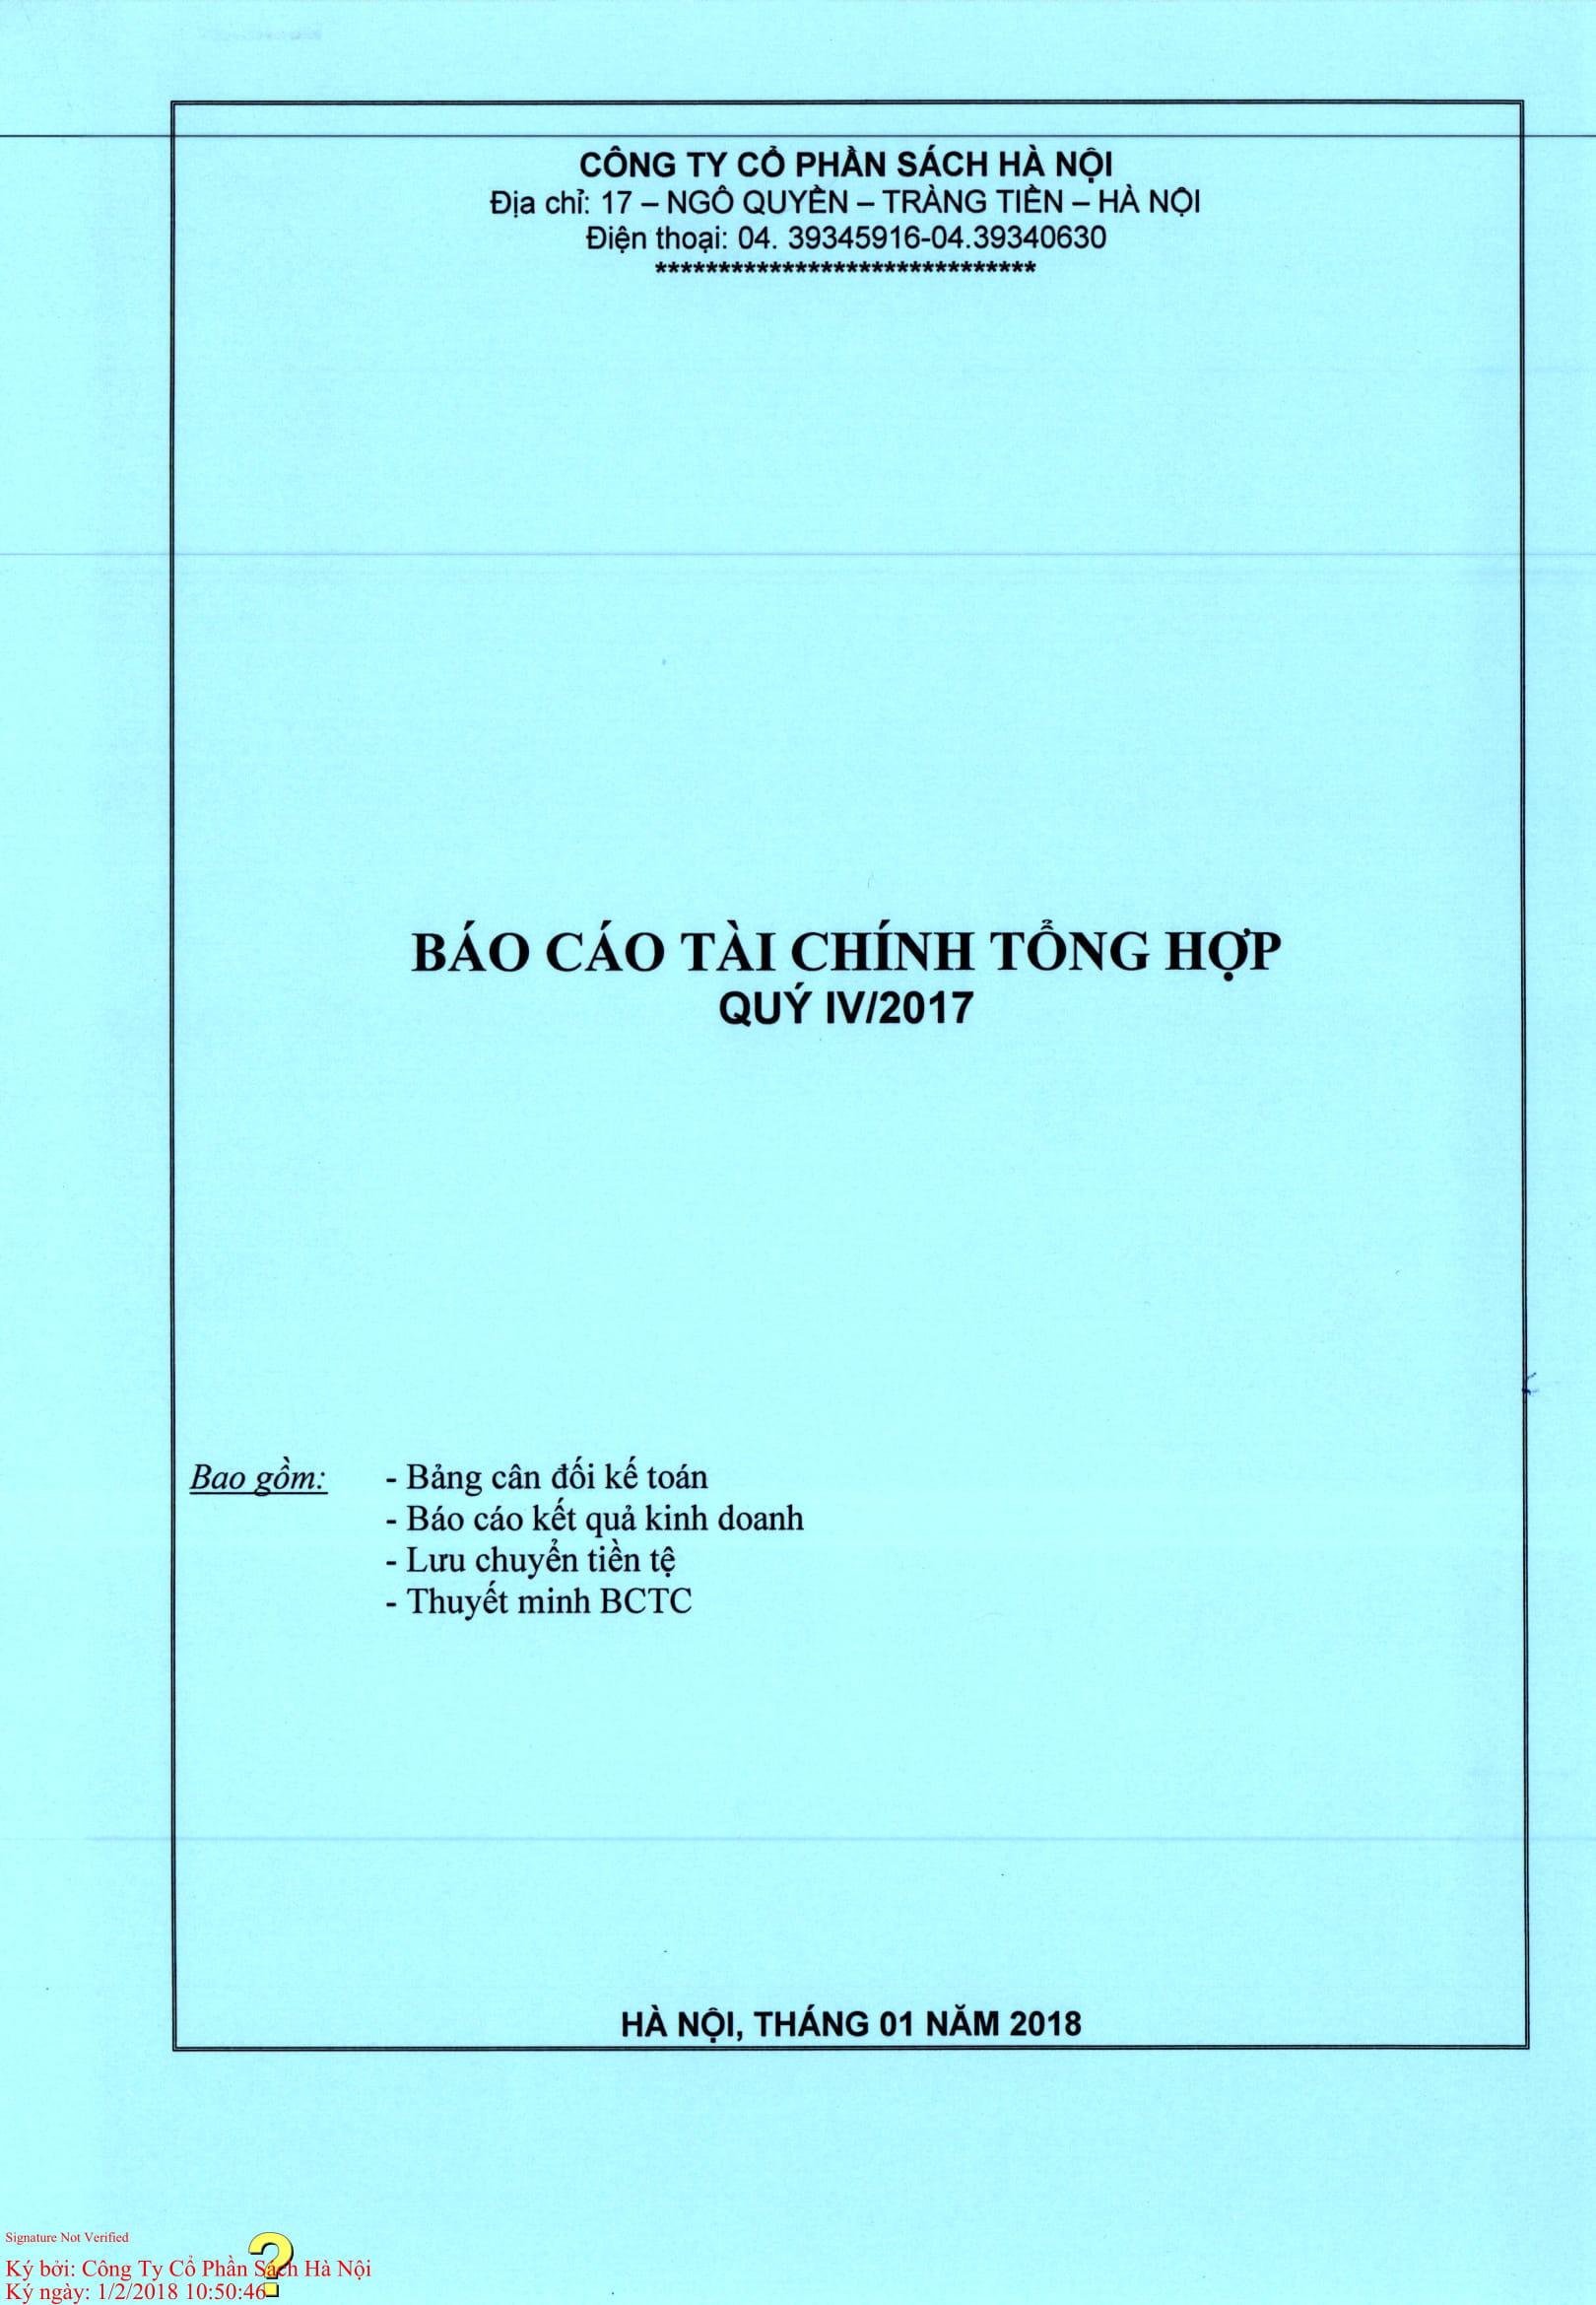 BCTC_quy4_2017_Tong hop-01